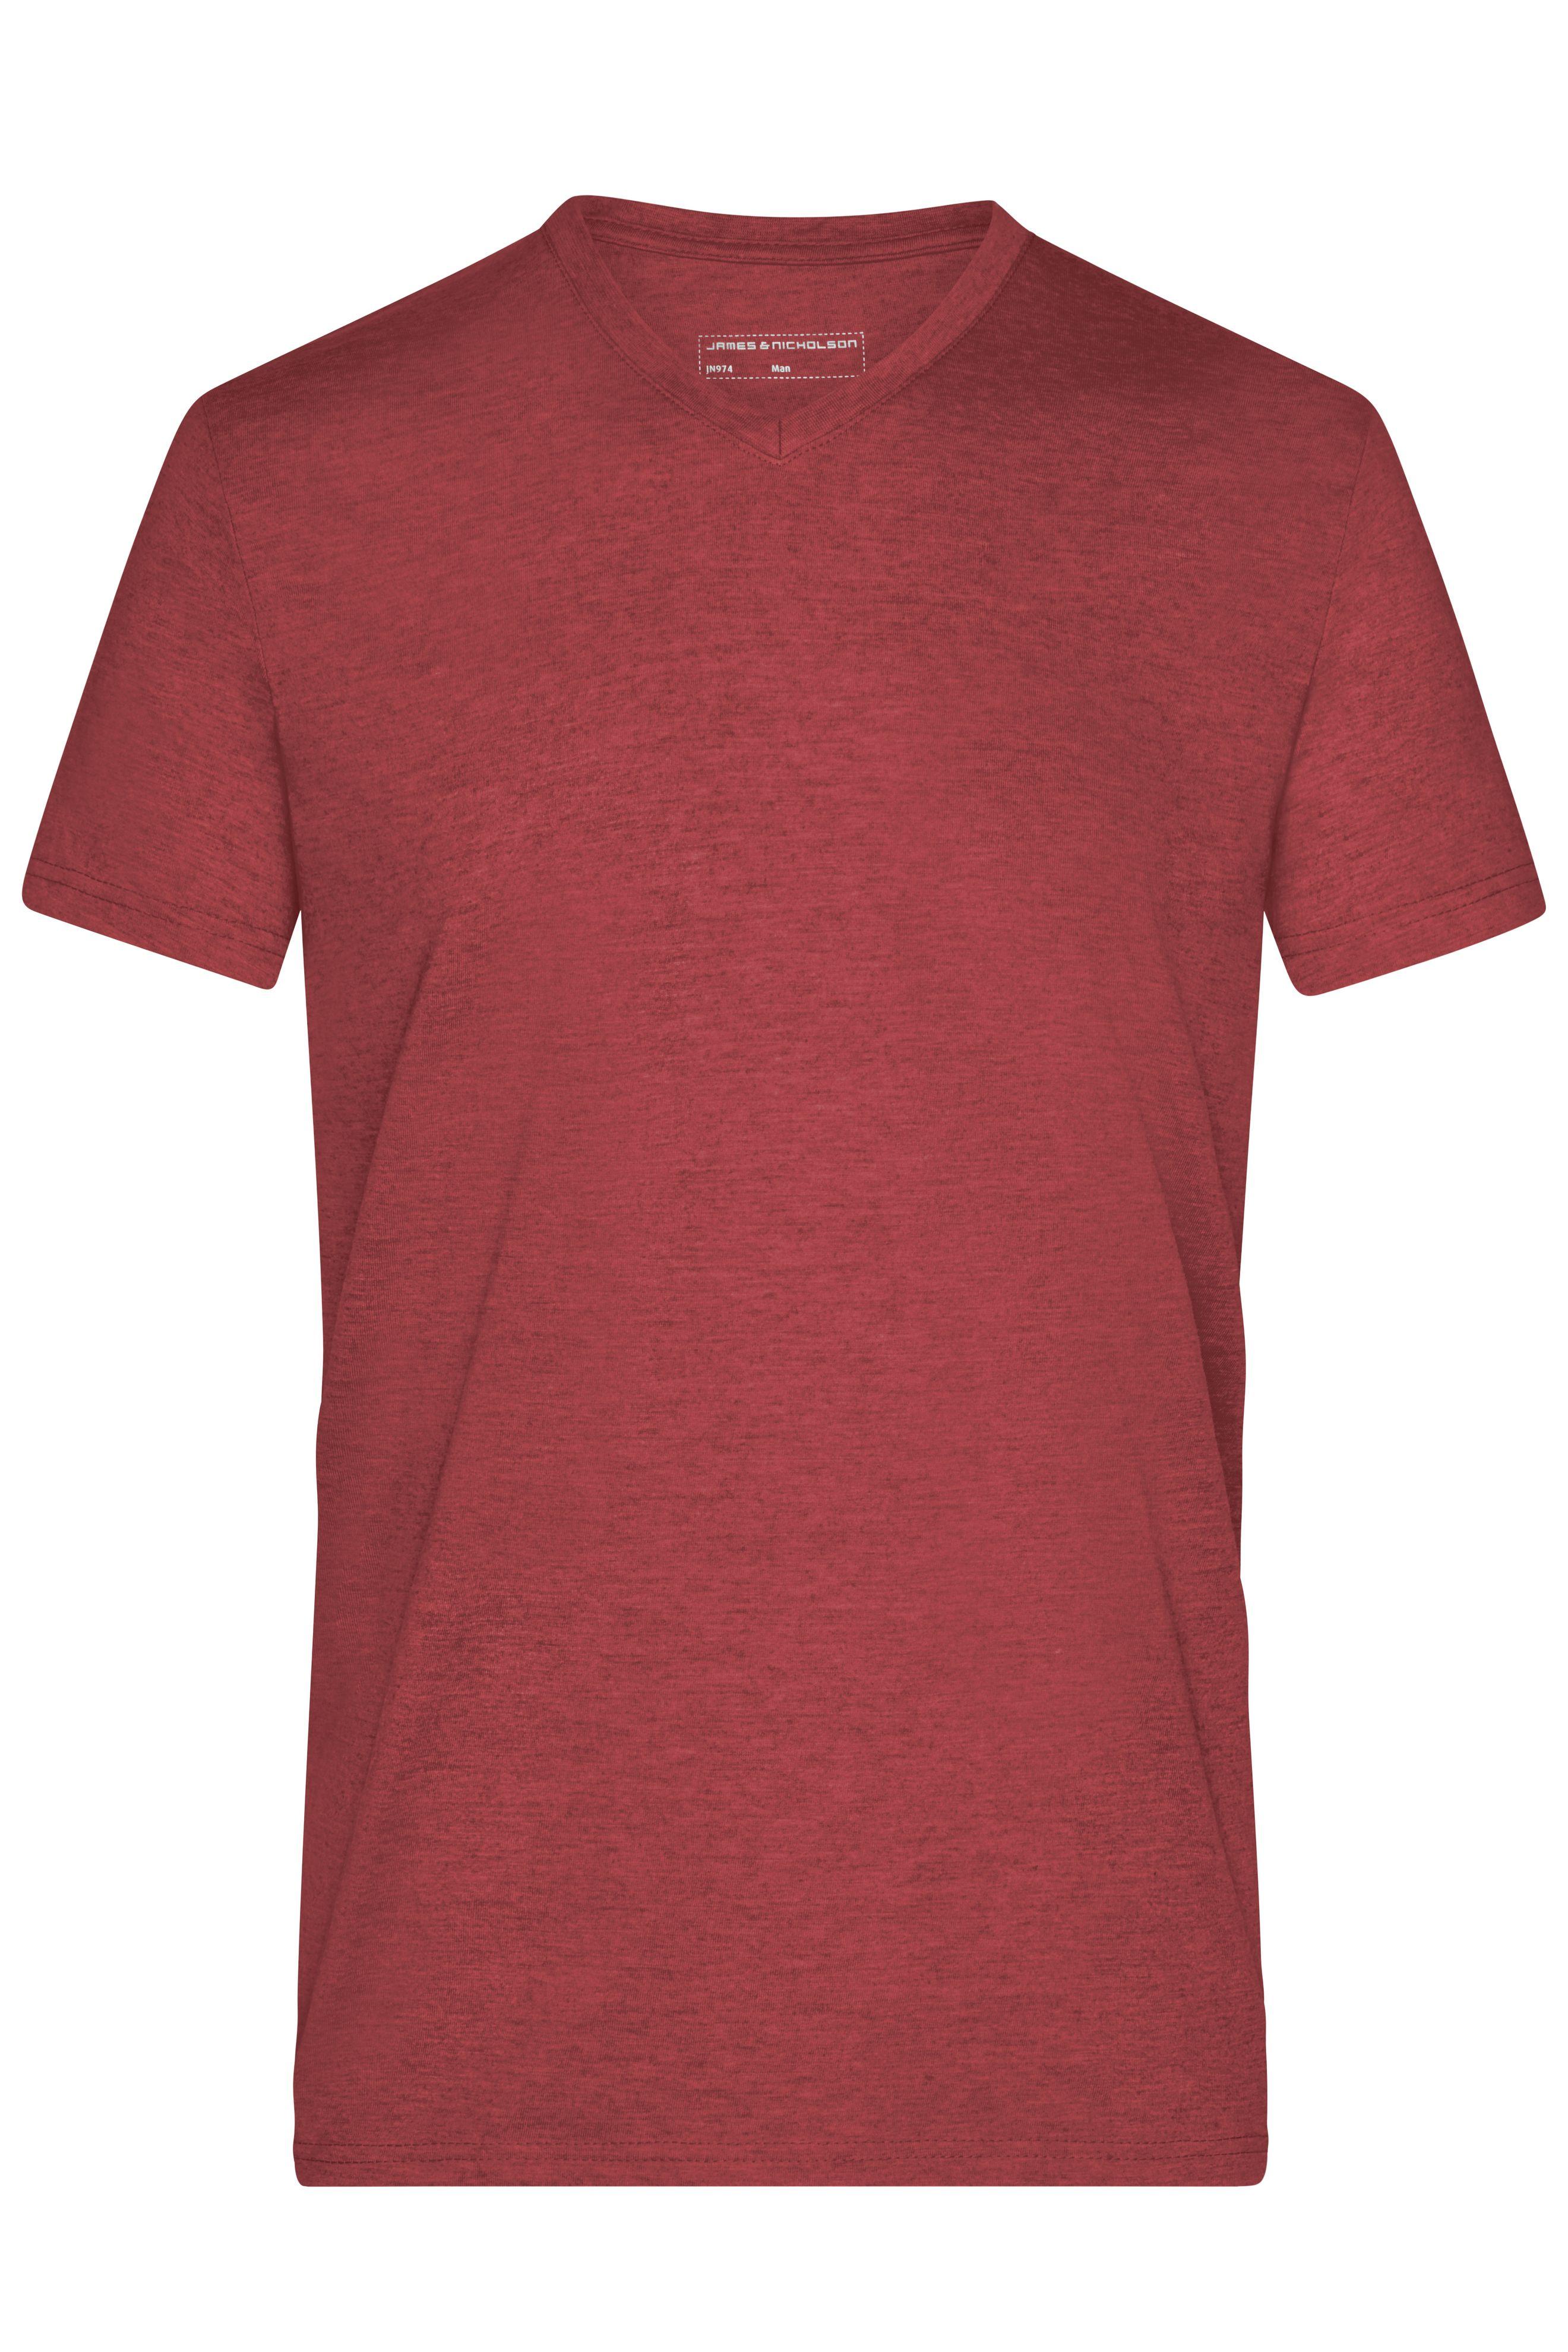 Modisches T-Shirt mit V-Ausschnitt